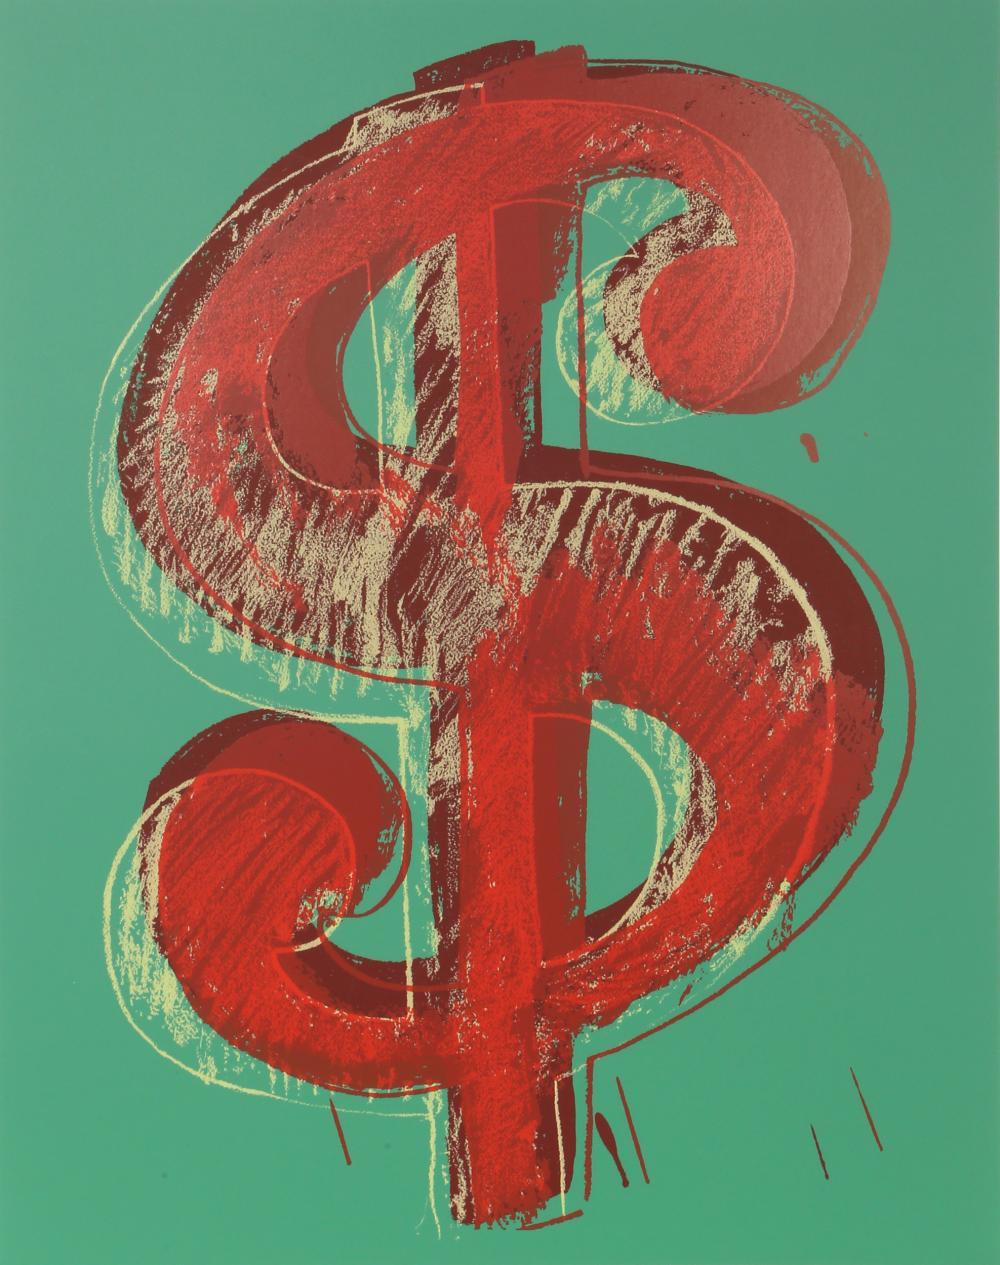 Andy Warhol, Dollar Sign (Green), Serigraph